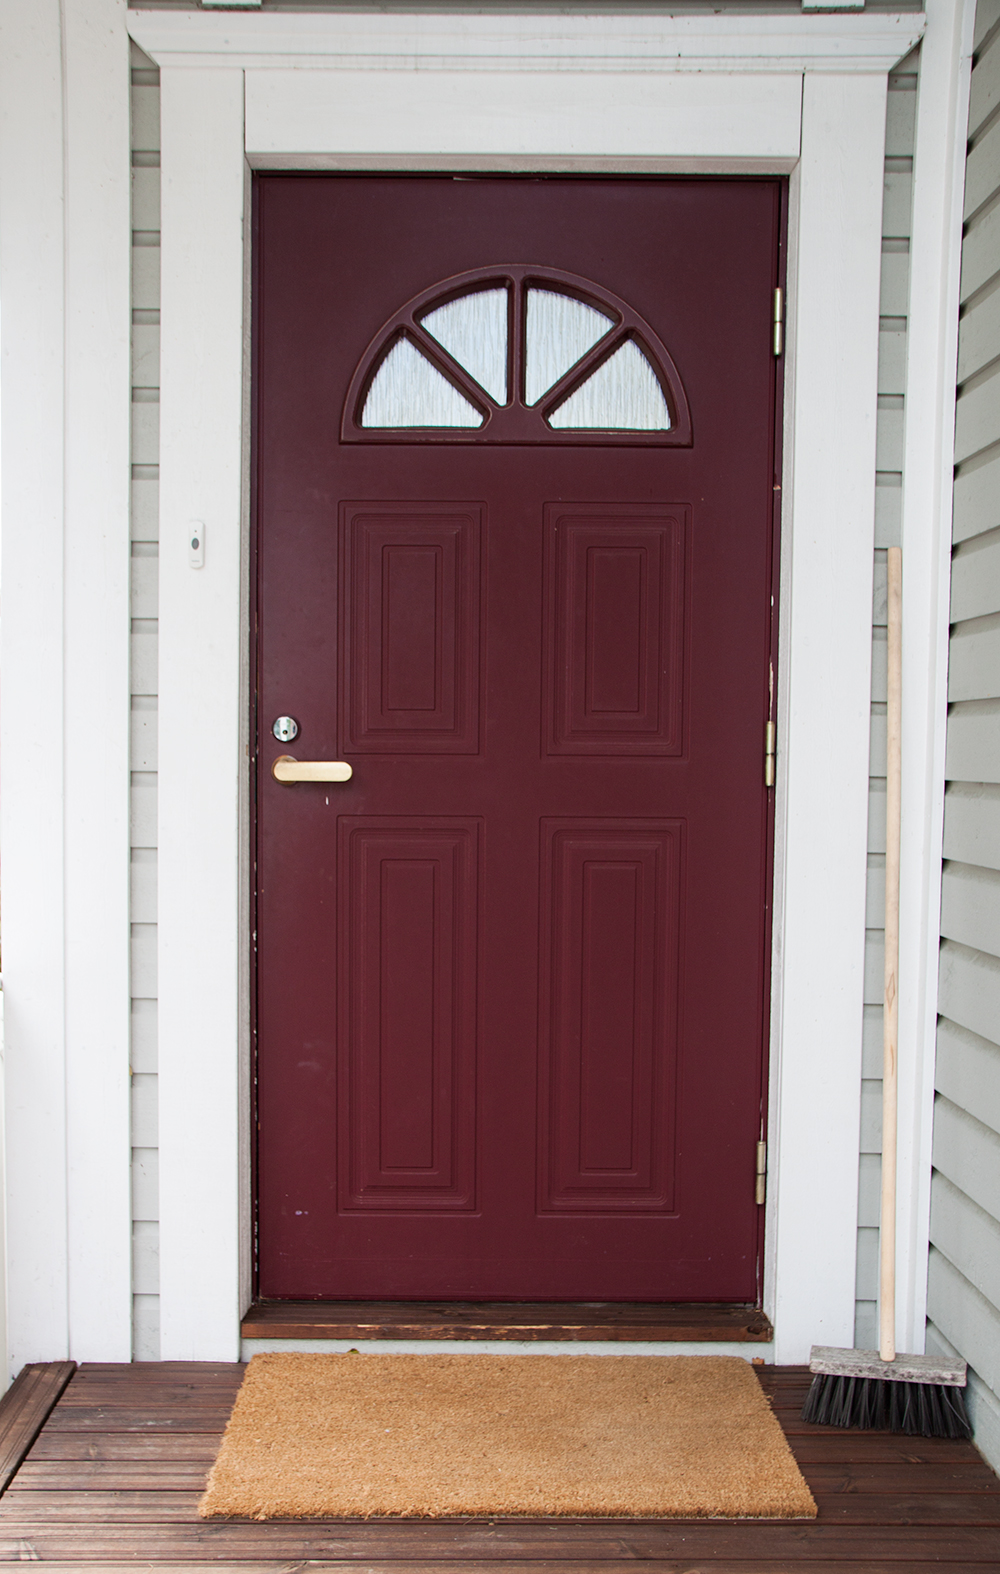 ovi_ennen